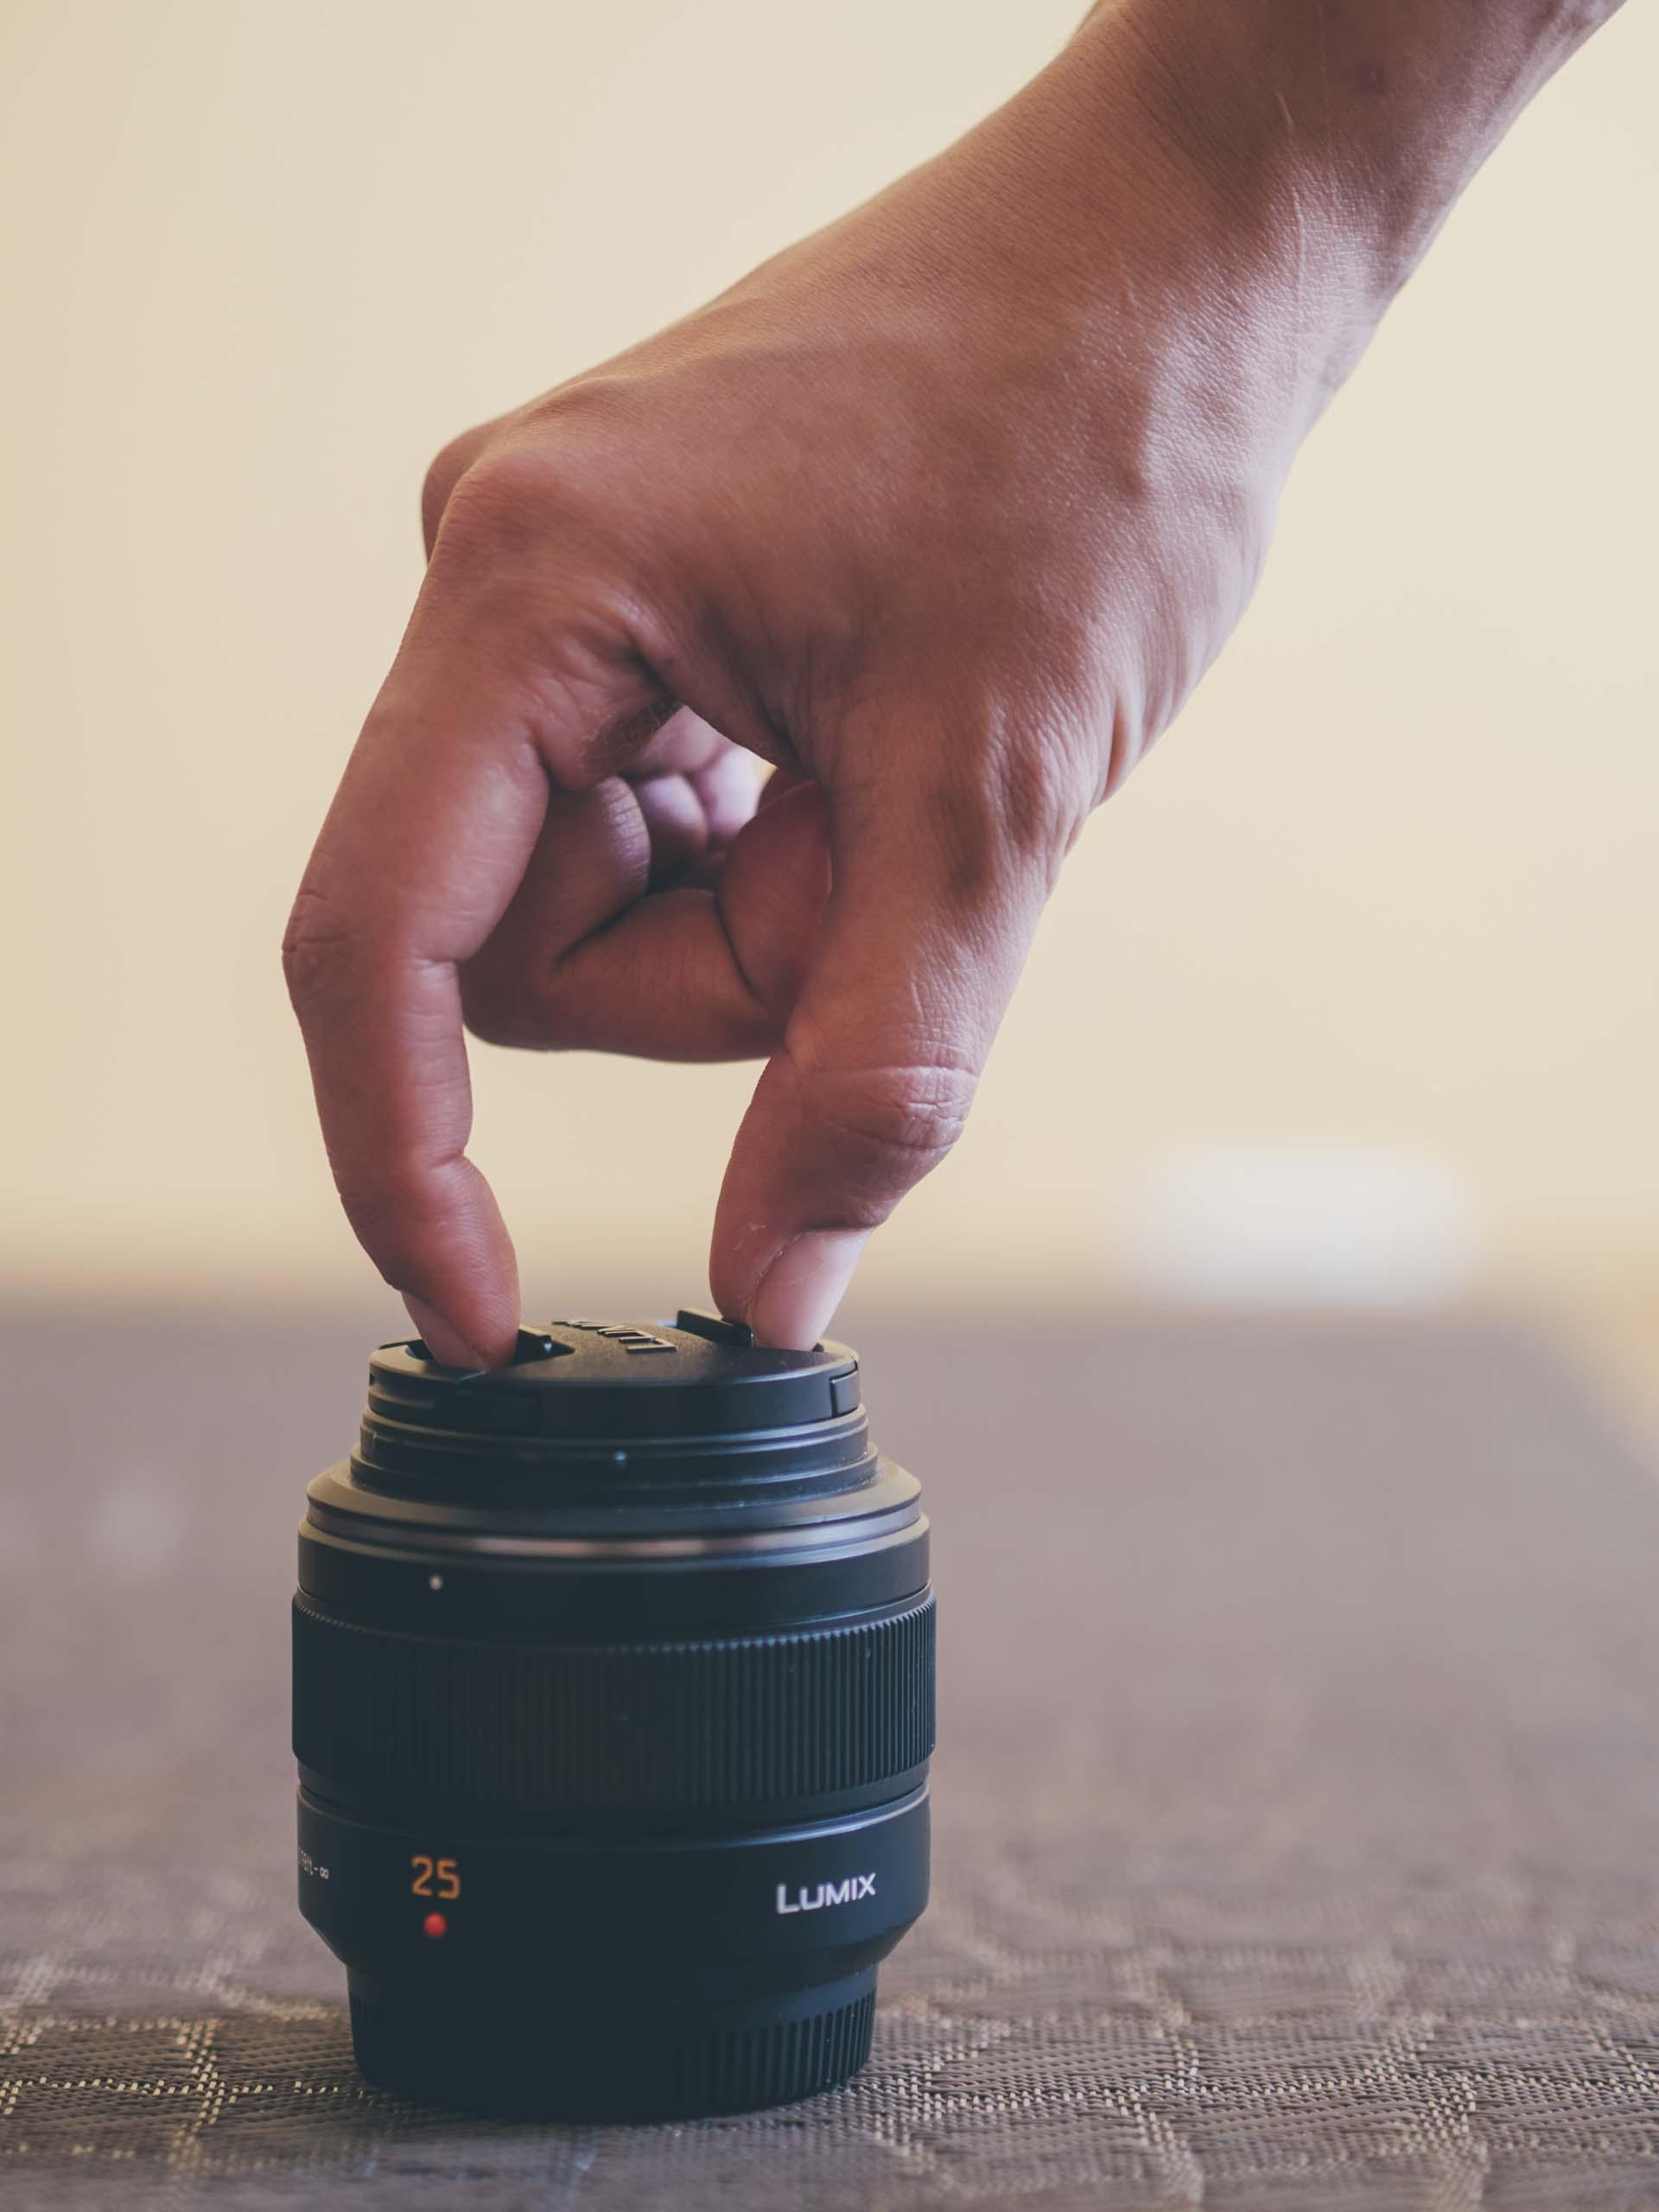 Panasonic Leica 25mm Lens